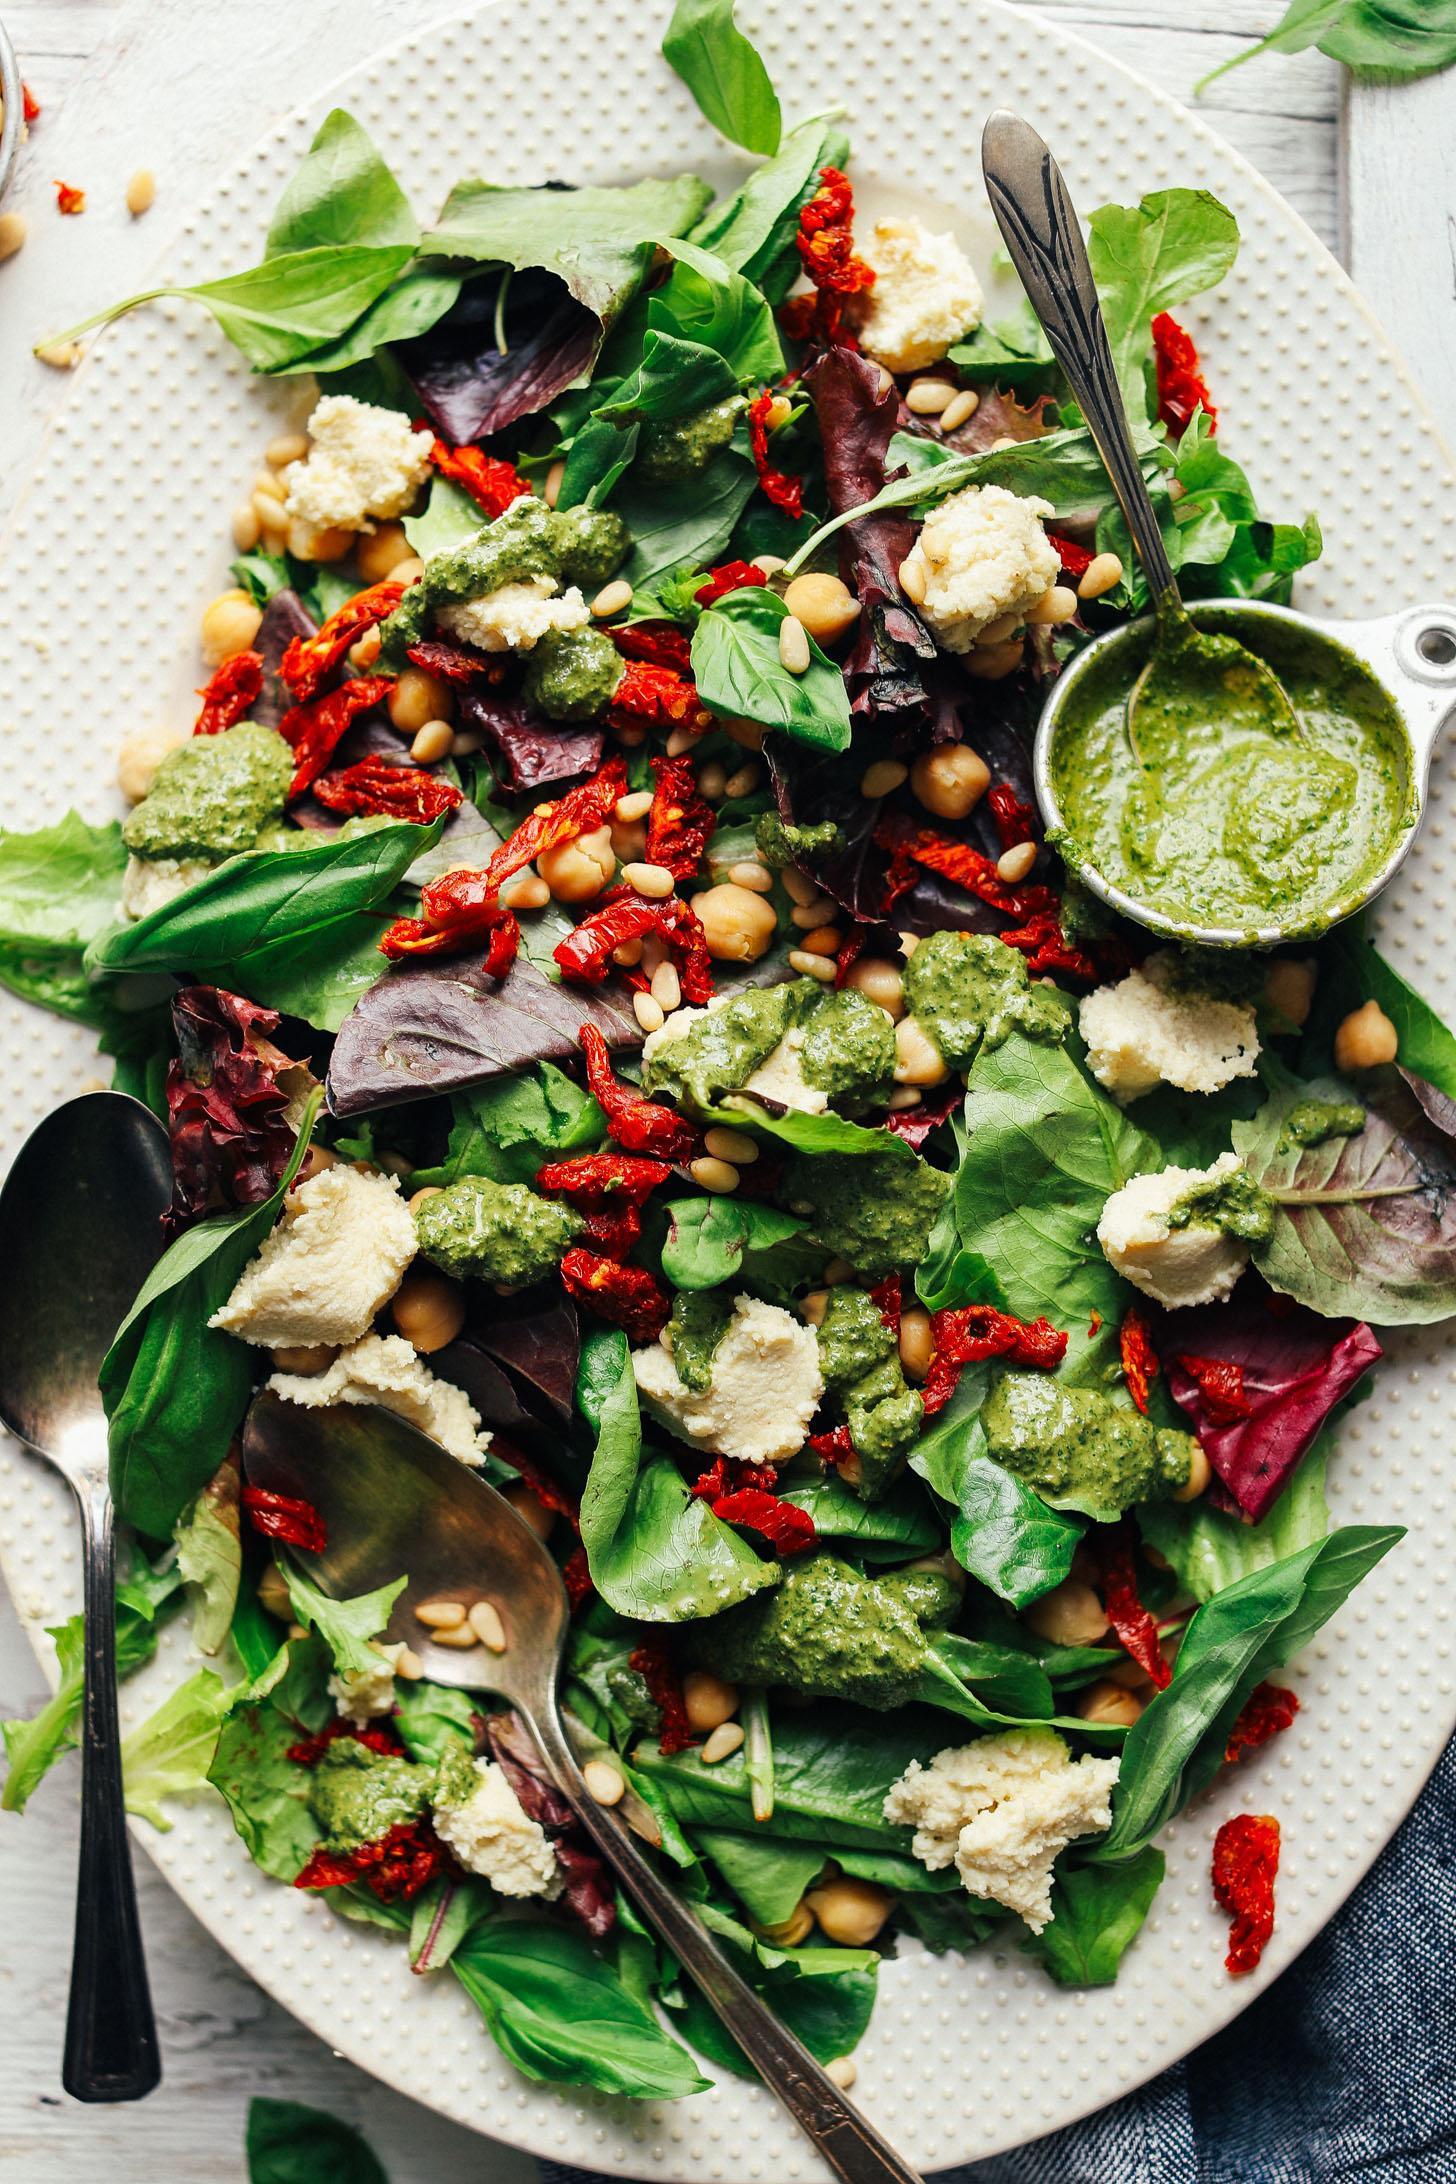 DELICIOUS Green Salad with Almond Ricotta, Vibrant Pesto, and Sun-Dried Tomatoes! 30 minutes, simple ingredients, SO healthy! #vegan #plantbased #pesto #salad #recipe #glutenfree #minimalistbaker